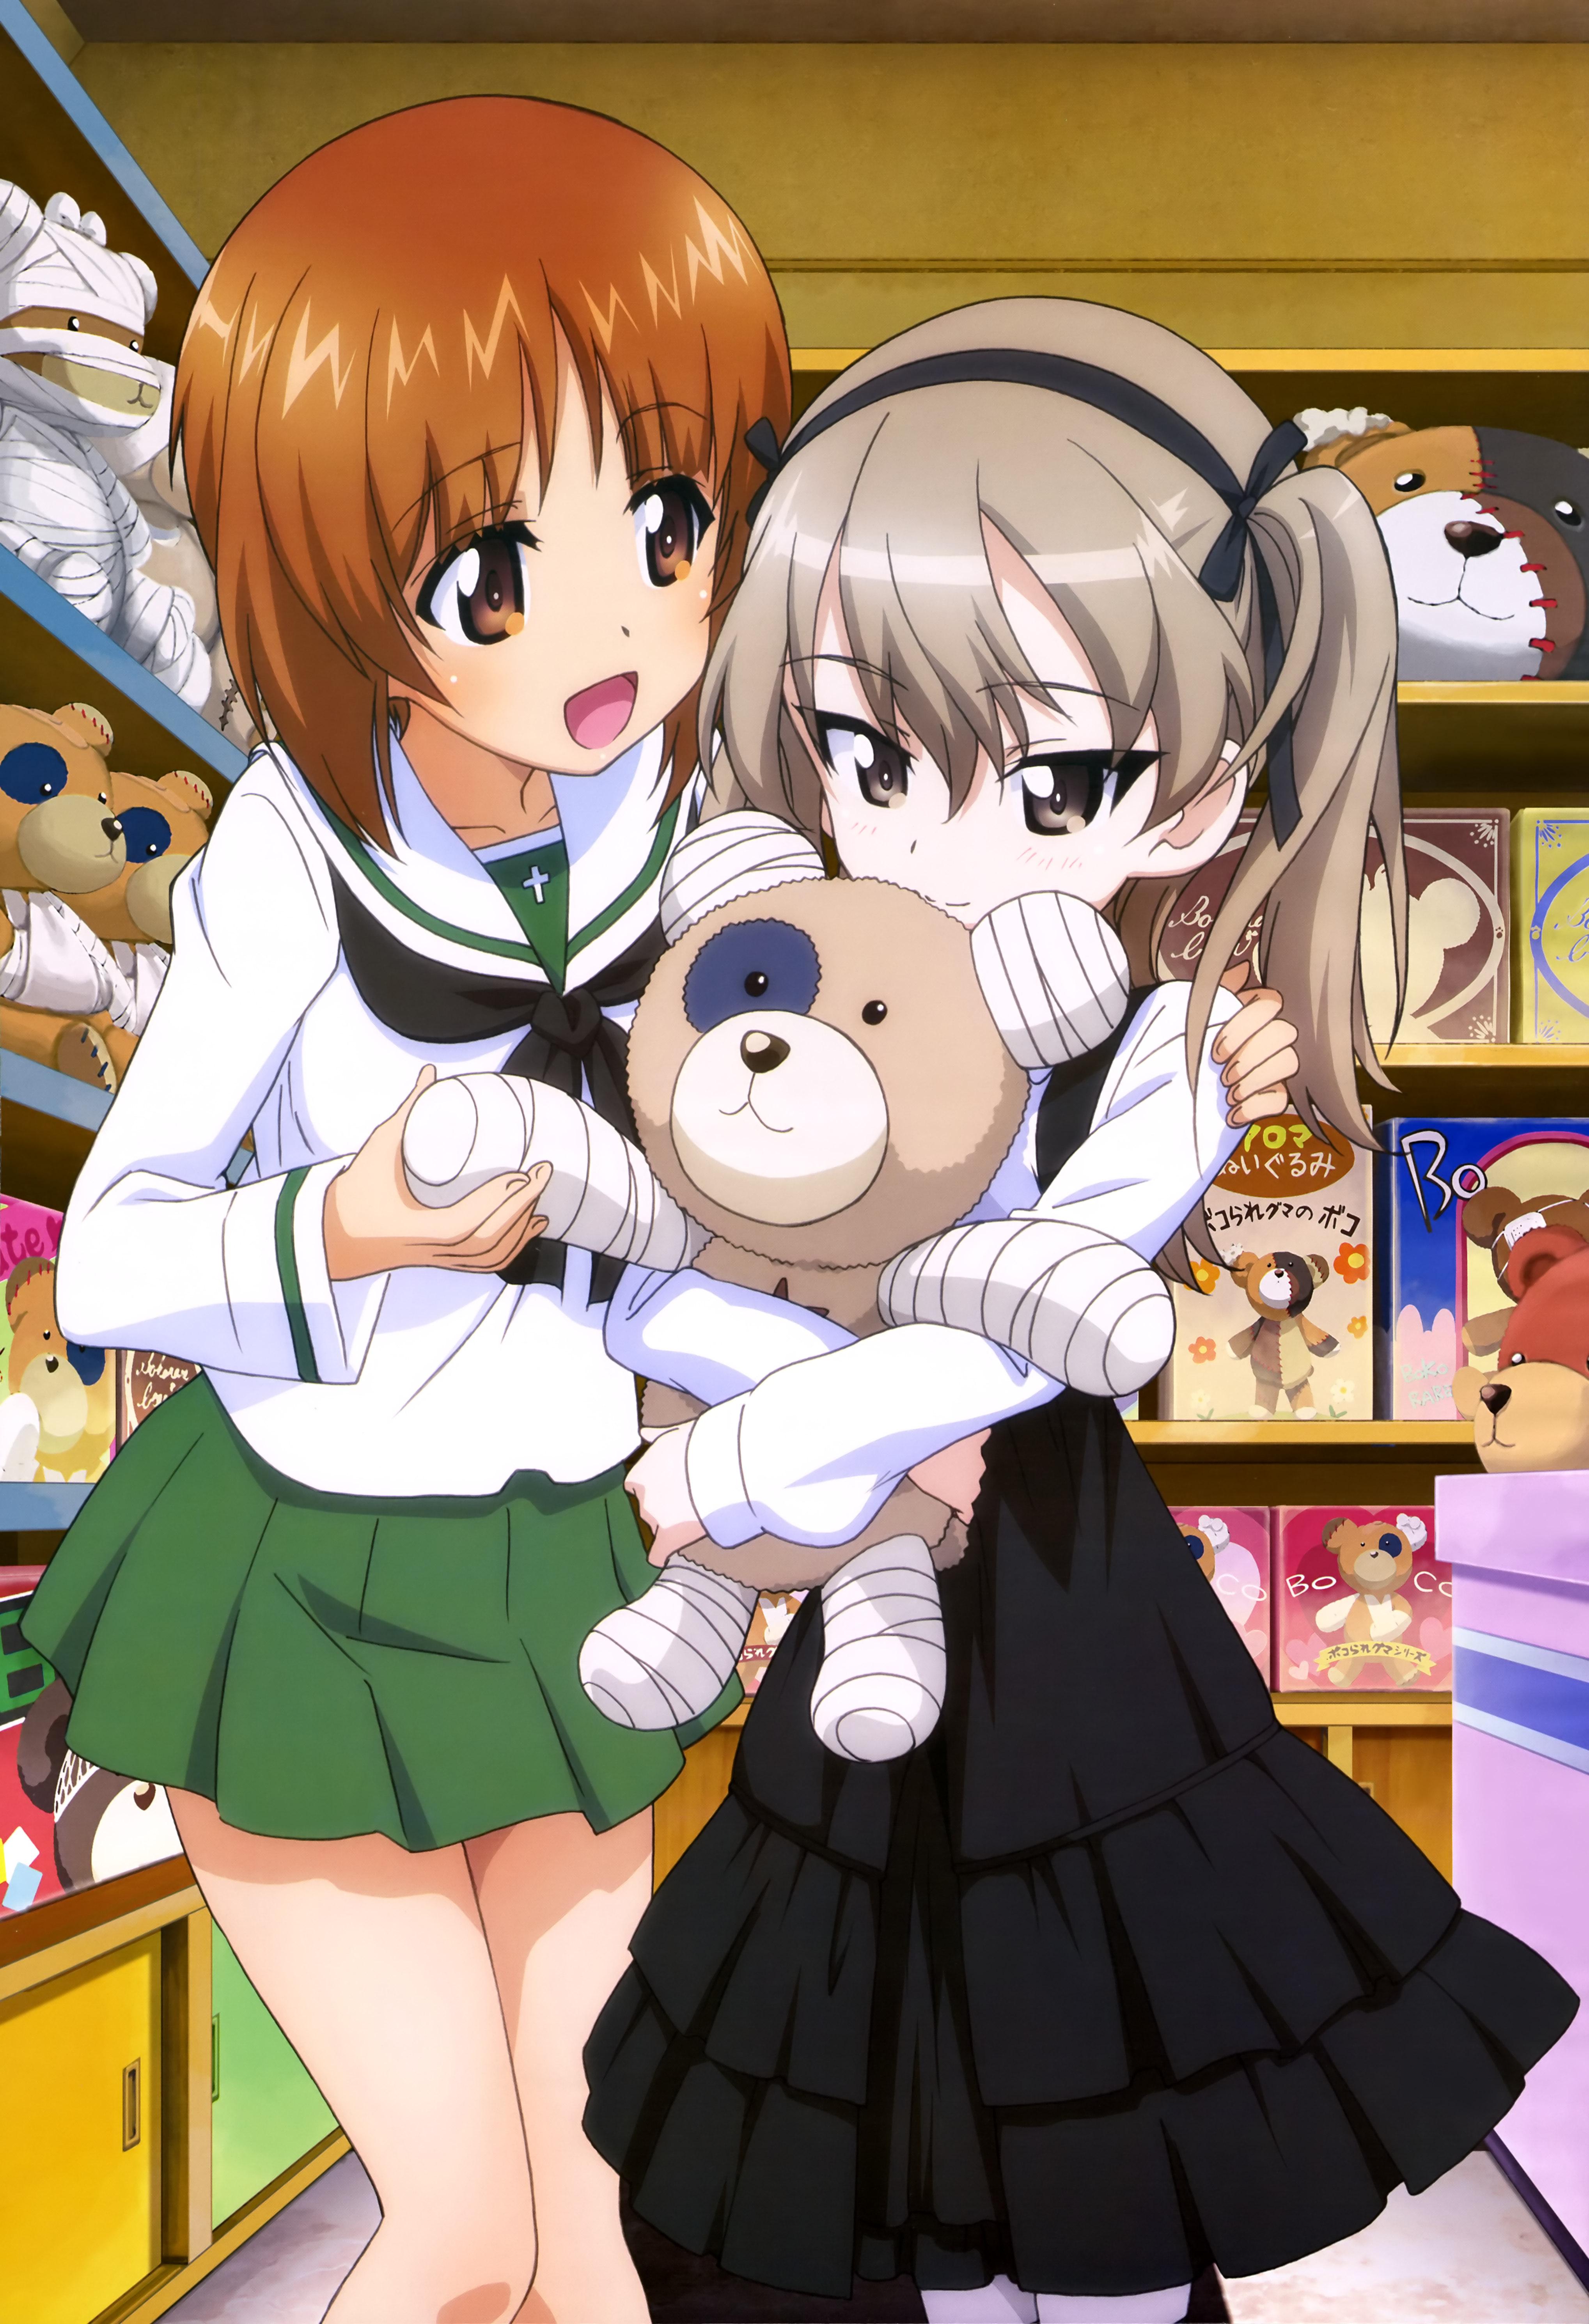 Girls Und Panzer Mobile Wallpaper Zerochan Anime Image Board